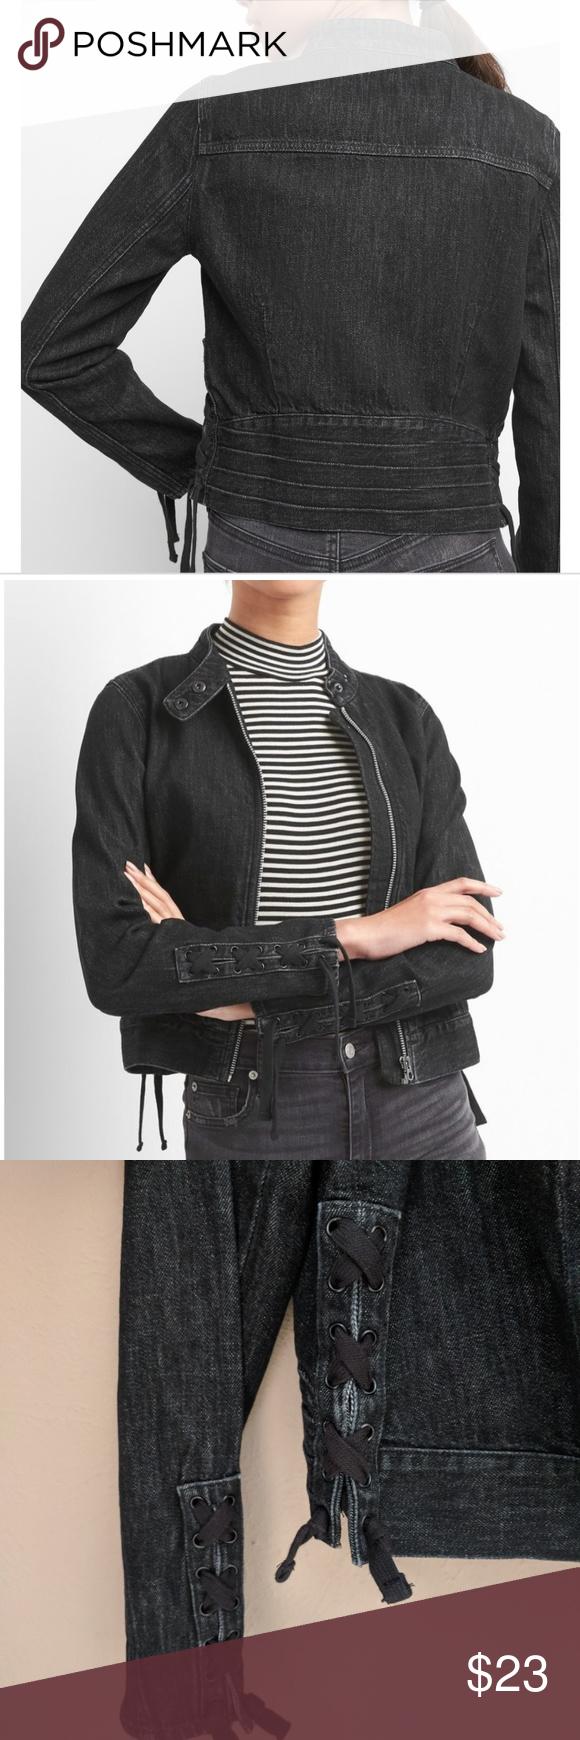 Nwt Black Denim Moto Jacket Black Denim Jackets Moto Jacket